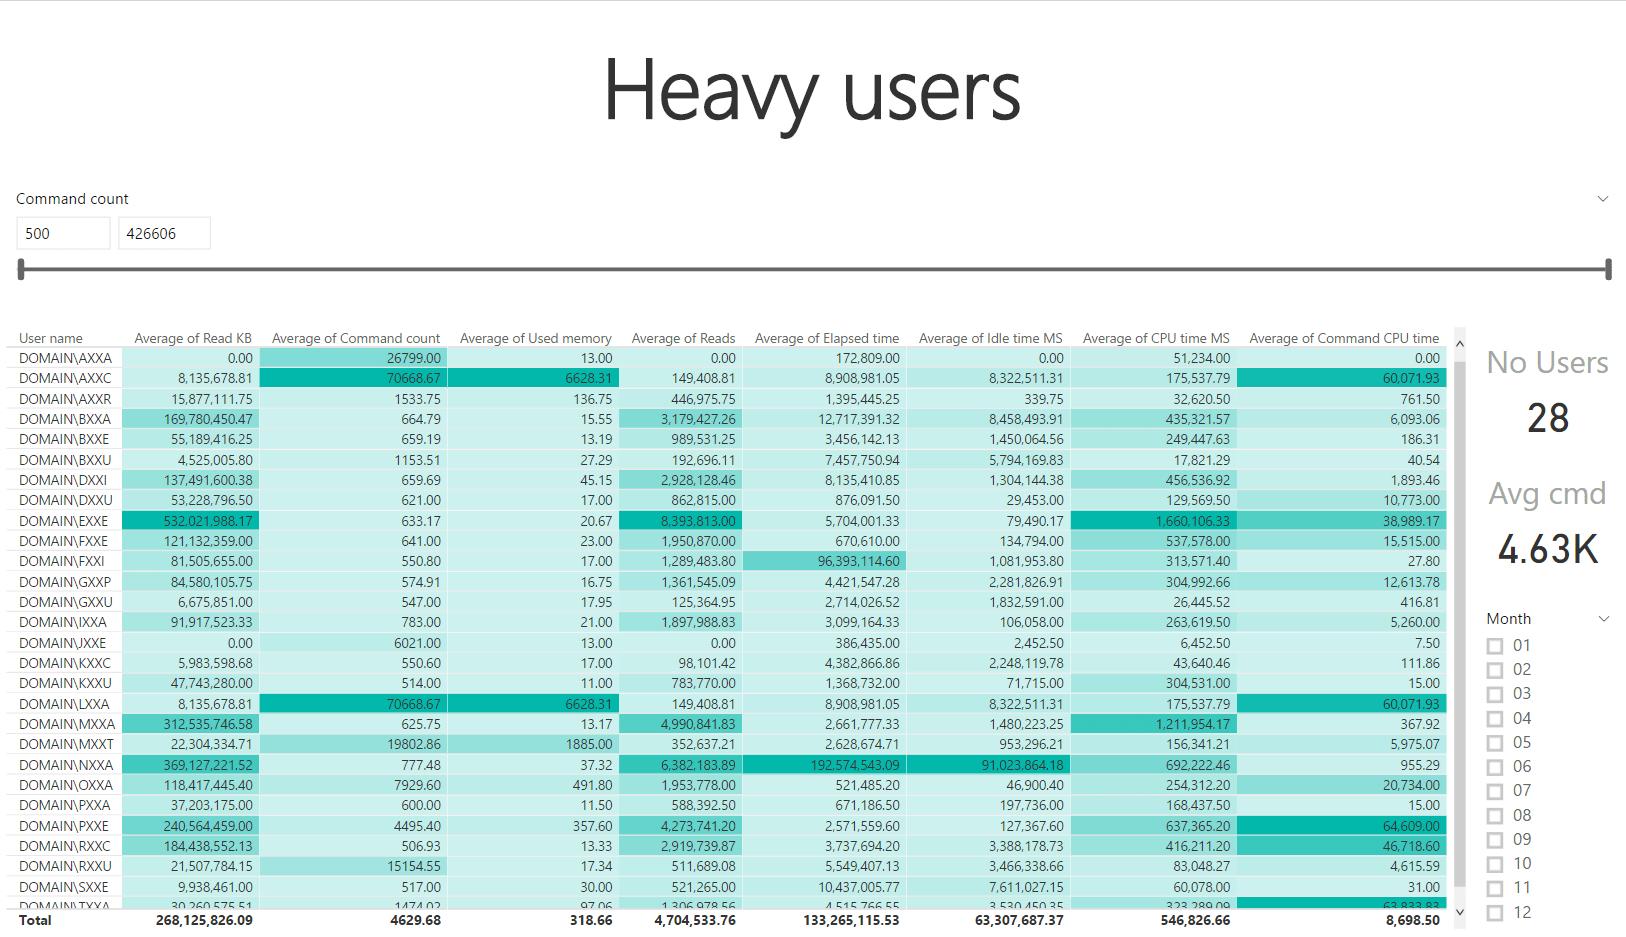 SSAS heavy users